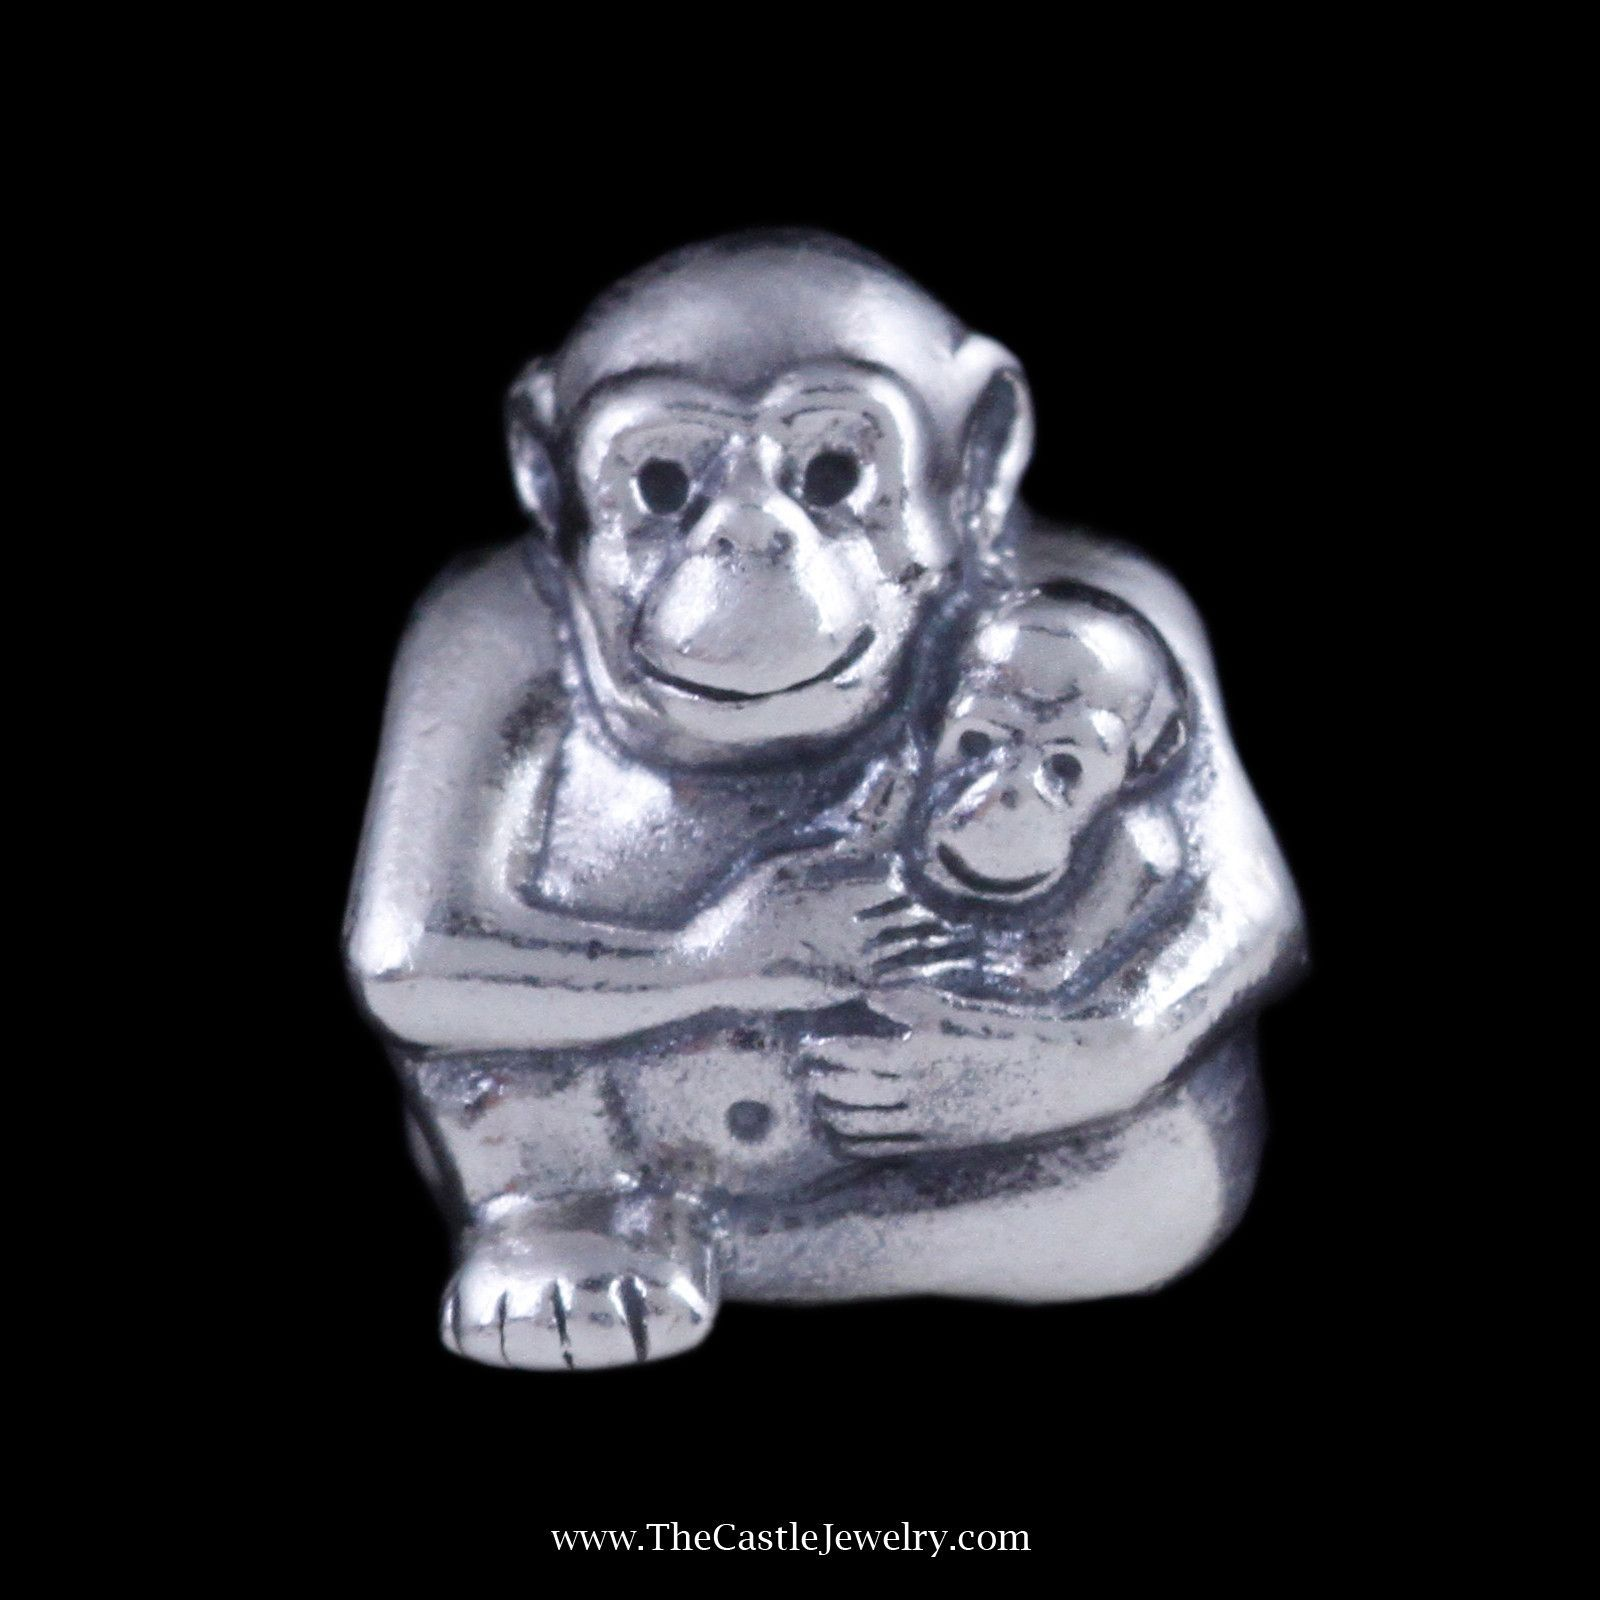 Retired Gorilla Pandora Charm in Sterling Silver